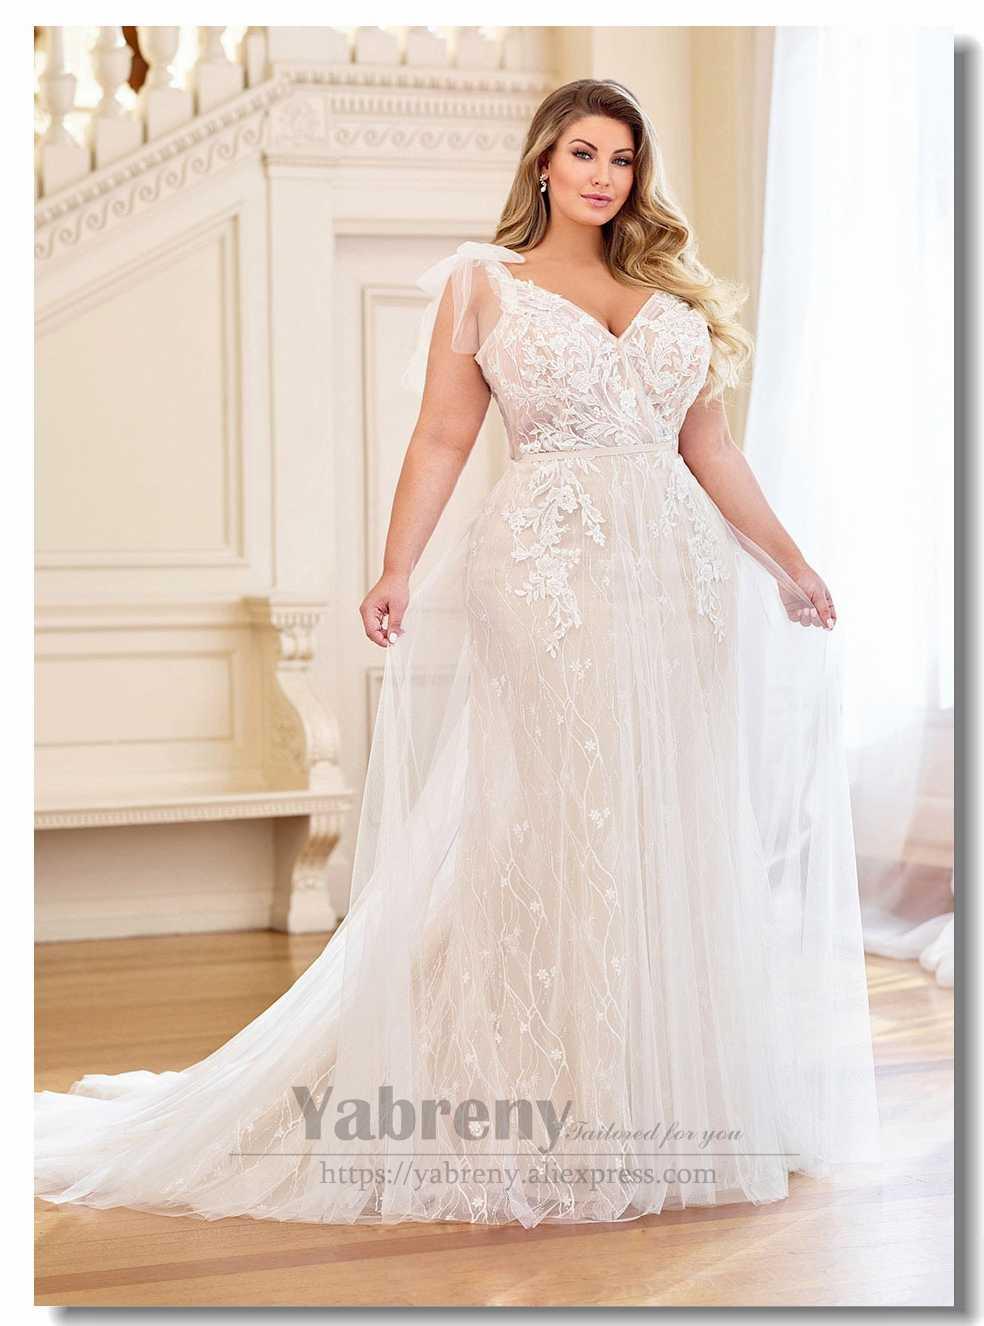 2019 New Arrival Plus Size Wedding Dresses Aliexpress